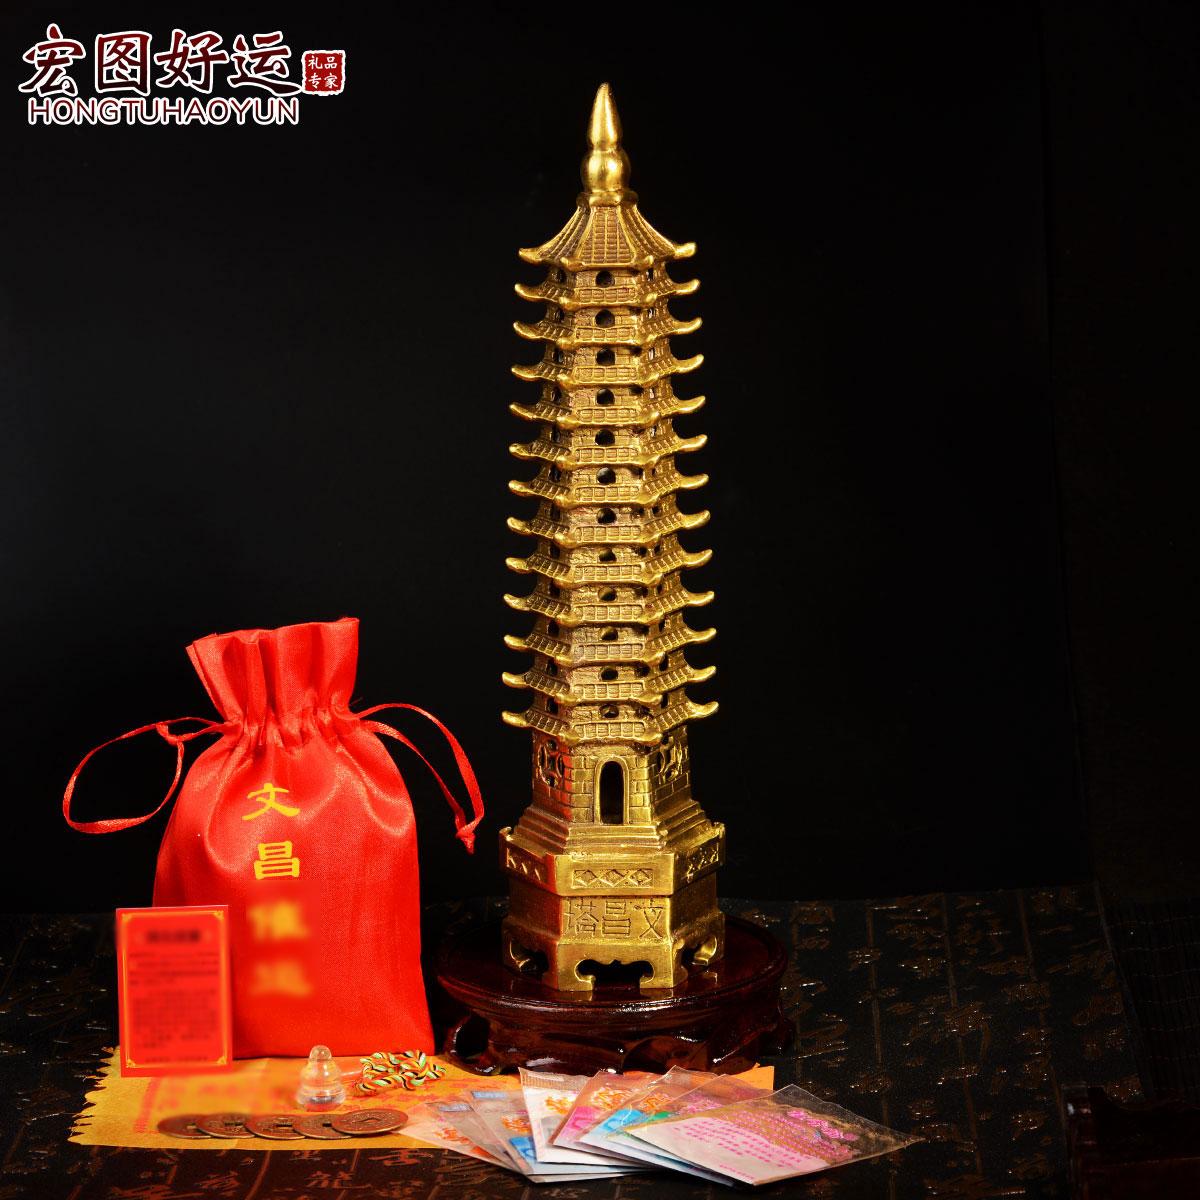 Статуэтки башни Вэньчан Артикул 45276001229